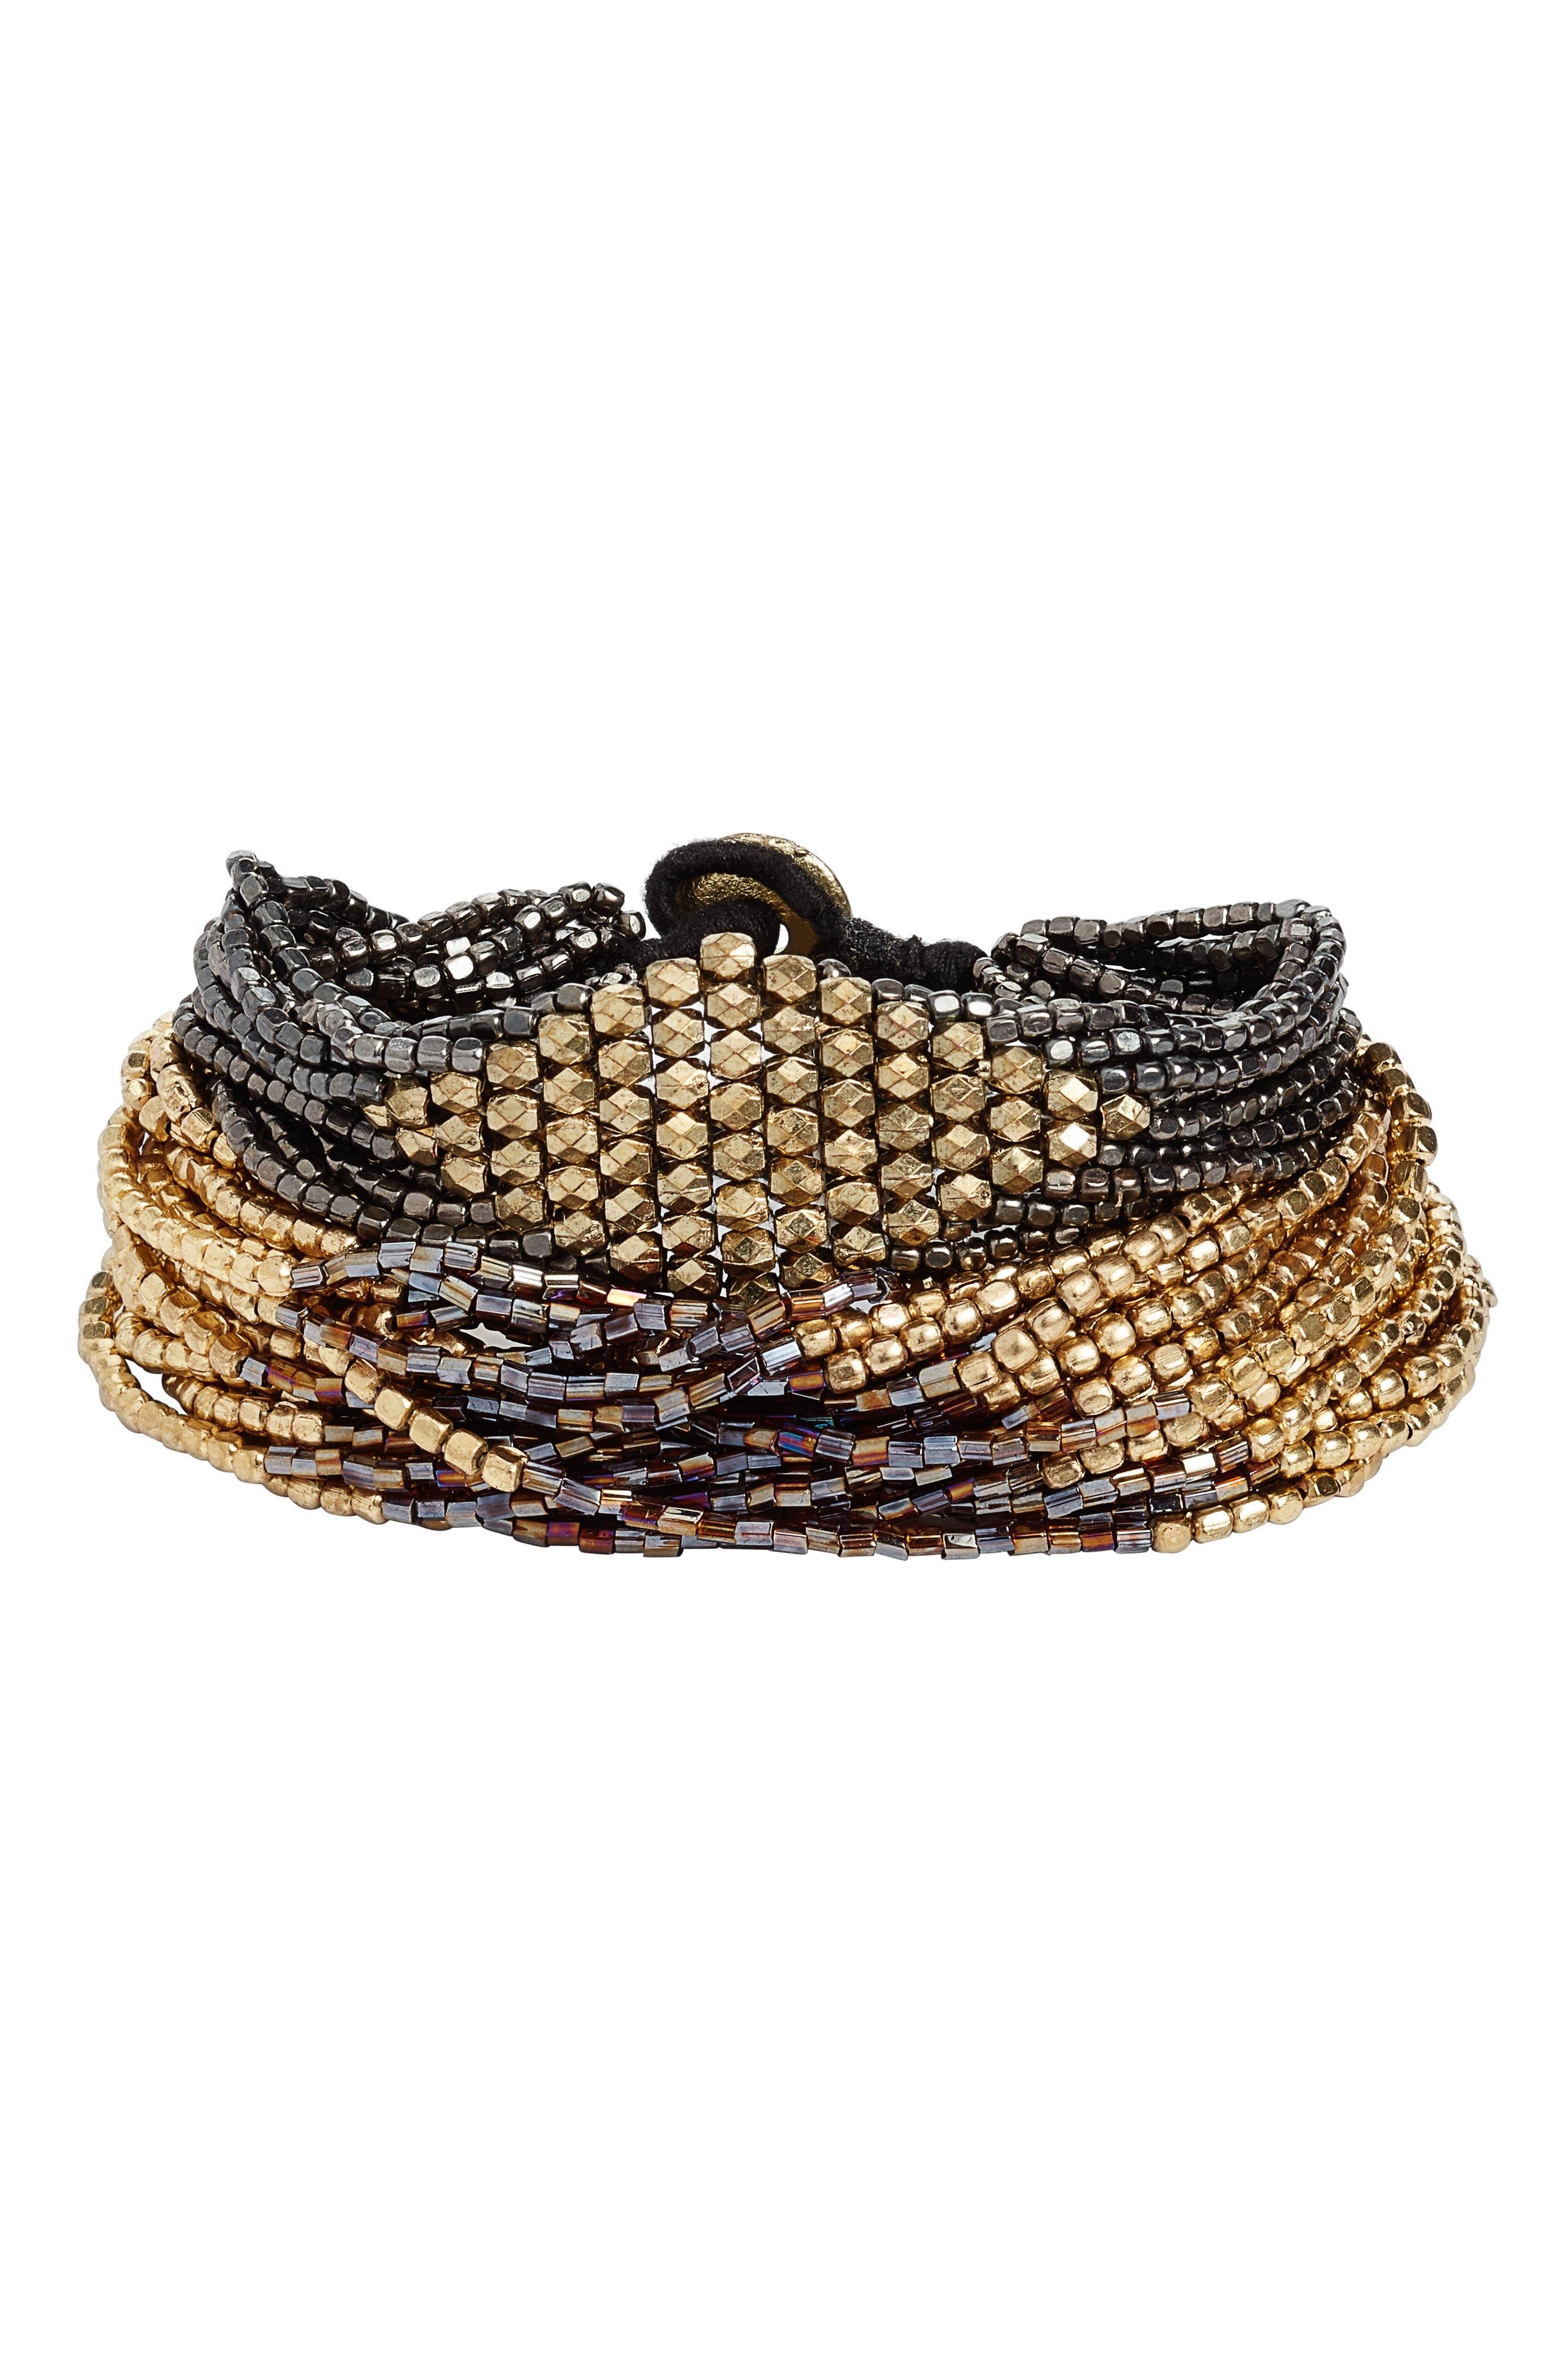 Main Image - Ink + Alloy Set of 2 Beaded Bracelets